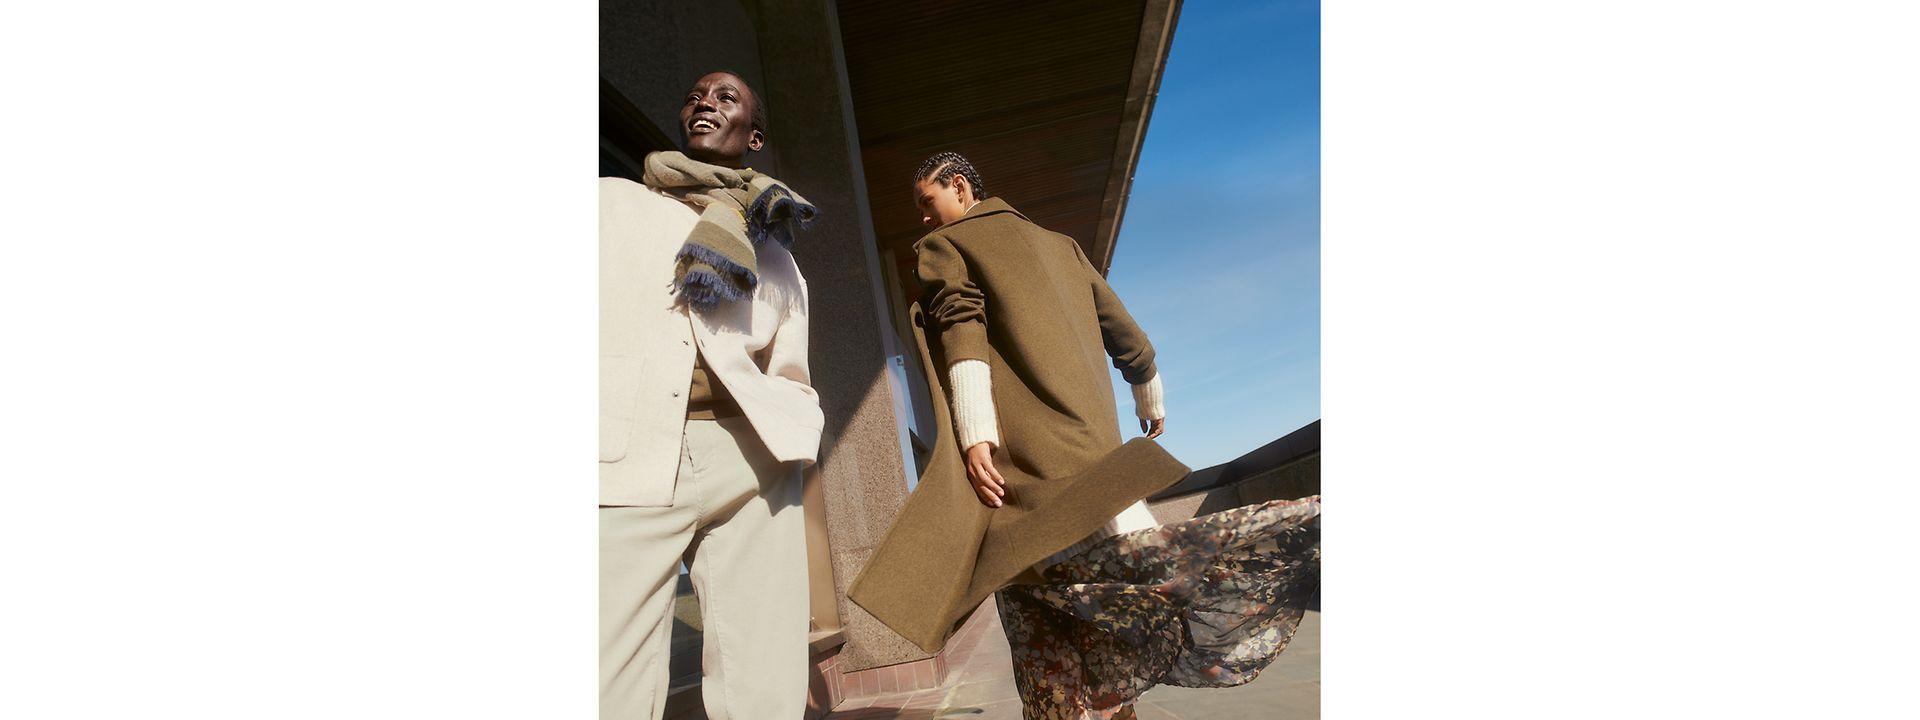 372021--W---Lookbook--Hero-Medium---Wool coats---IMGN_LJC_ESPRIT_Hello_FW21_Sh30_346